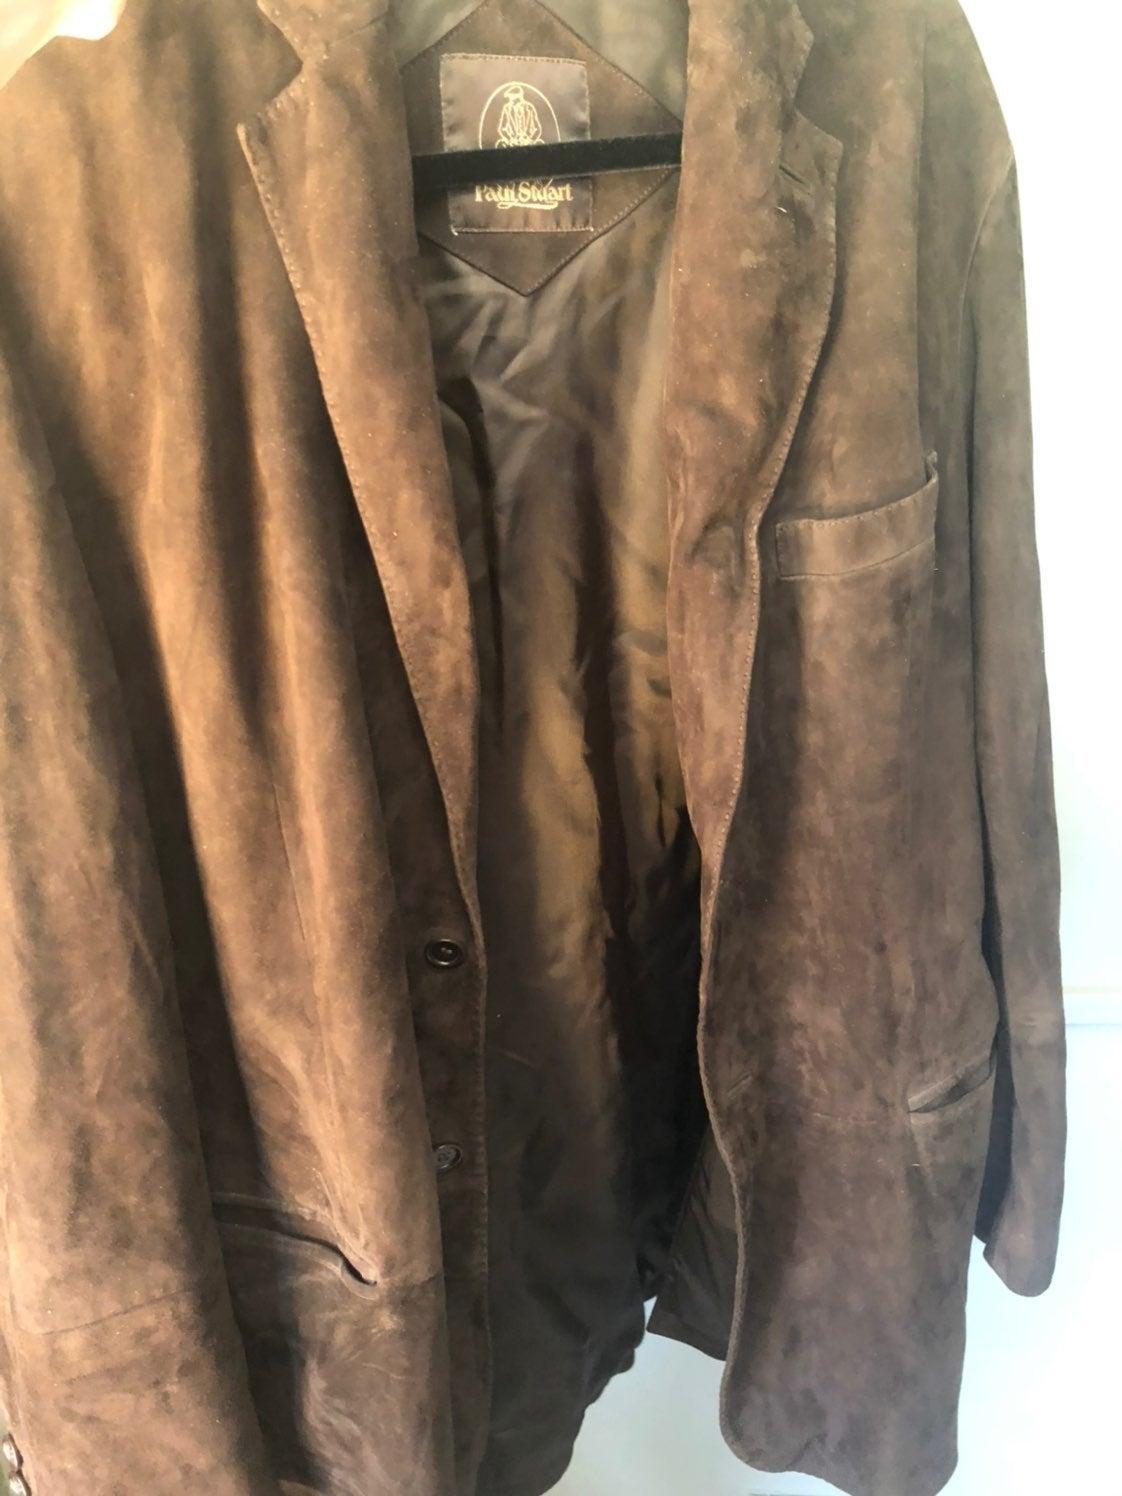 Paul Stuart suede leather jacket